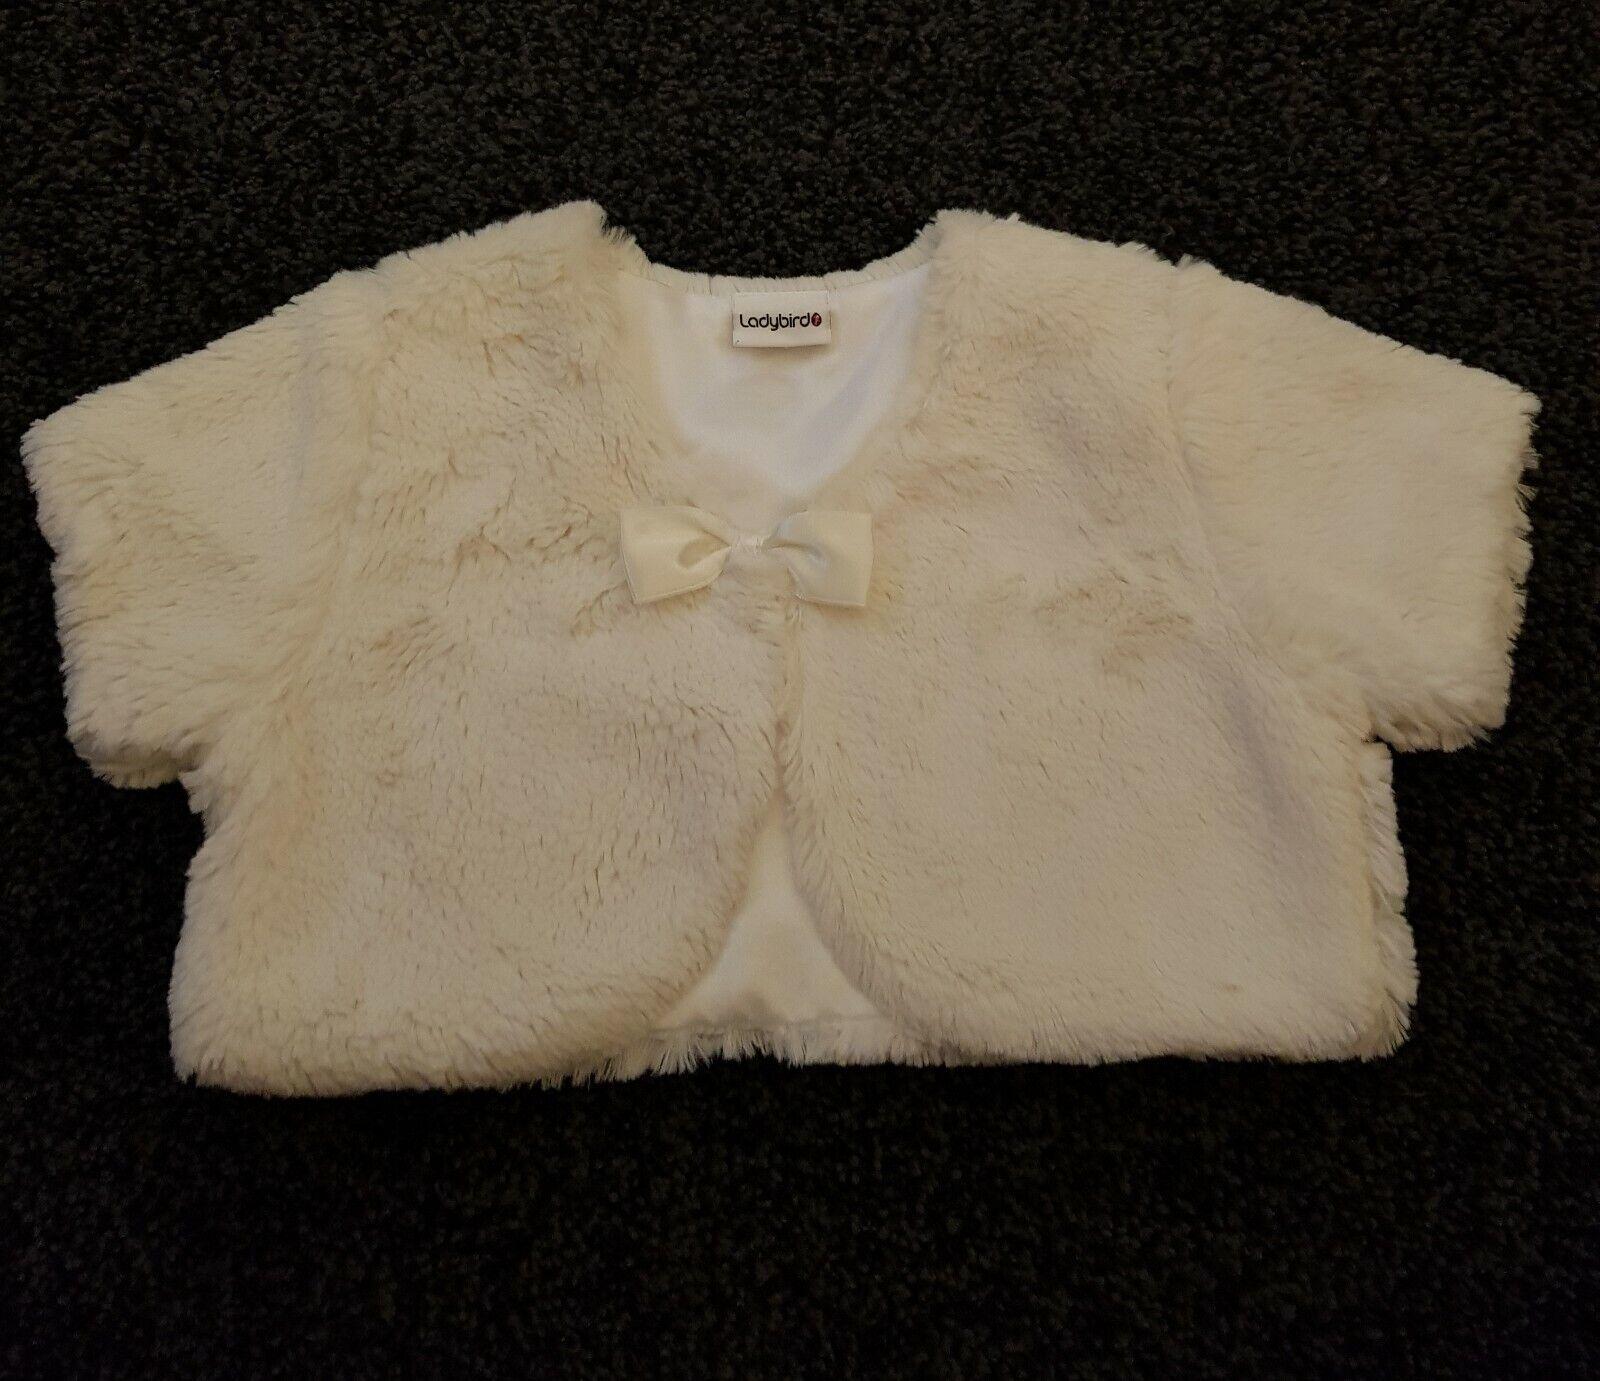 Girls Ladybird Cream/Ivory Faux Fur Bolero Size 18-24m